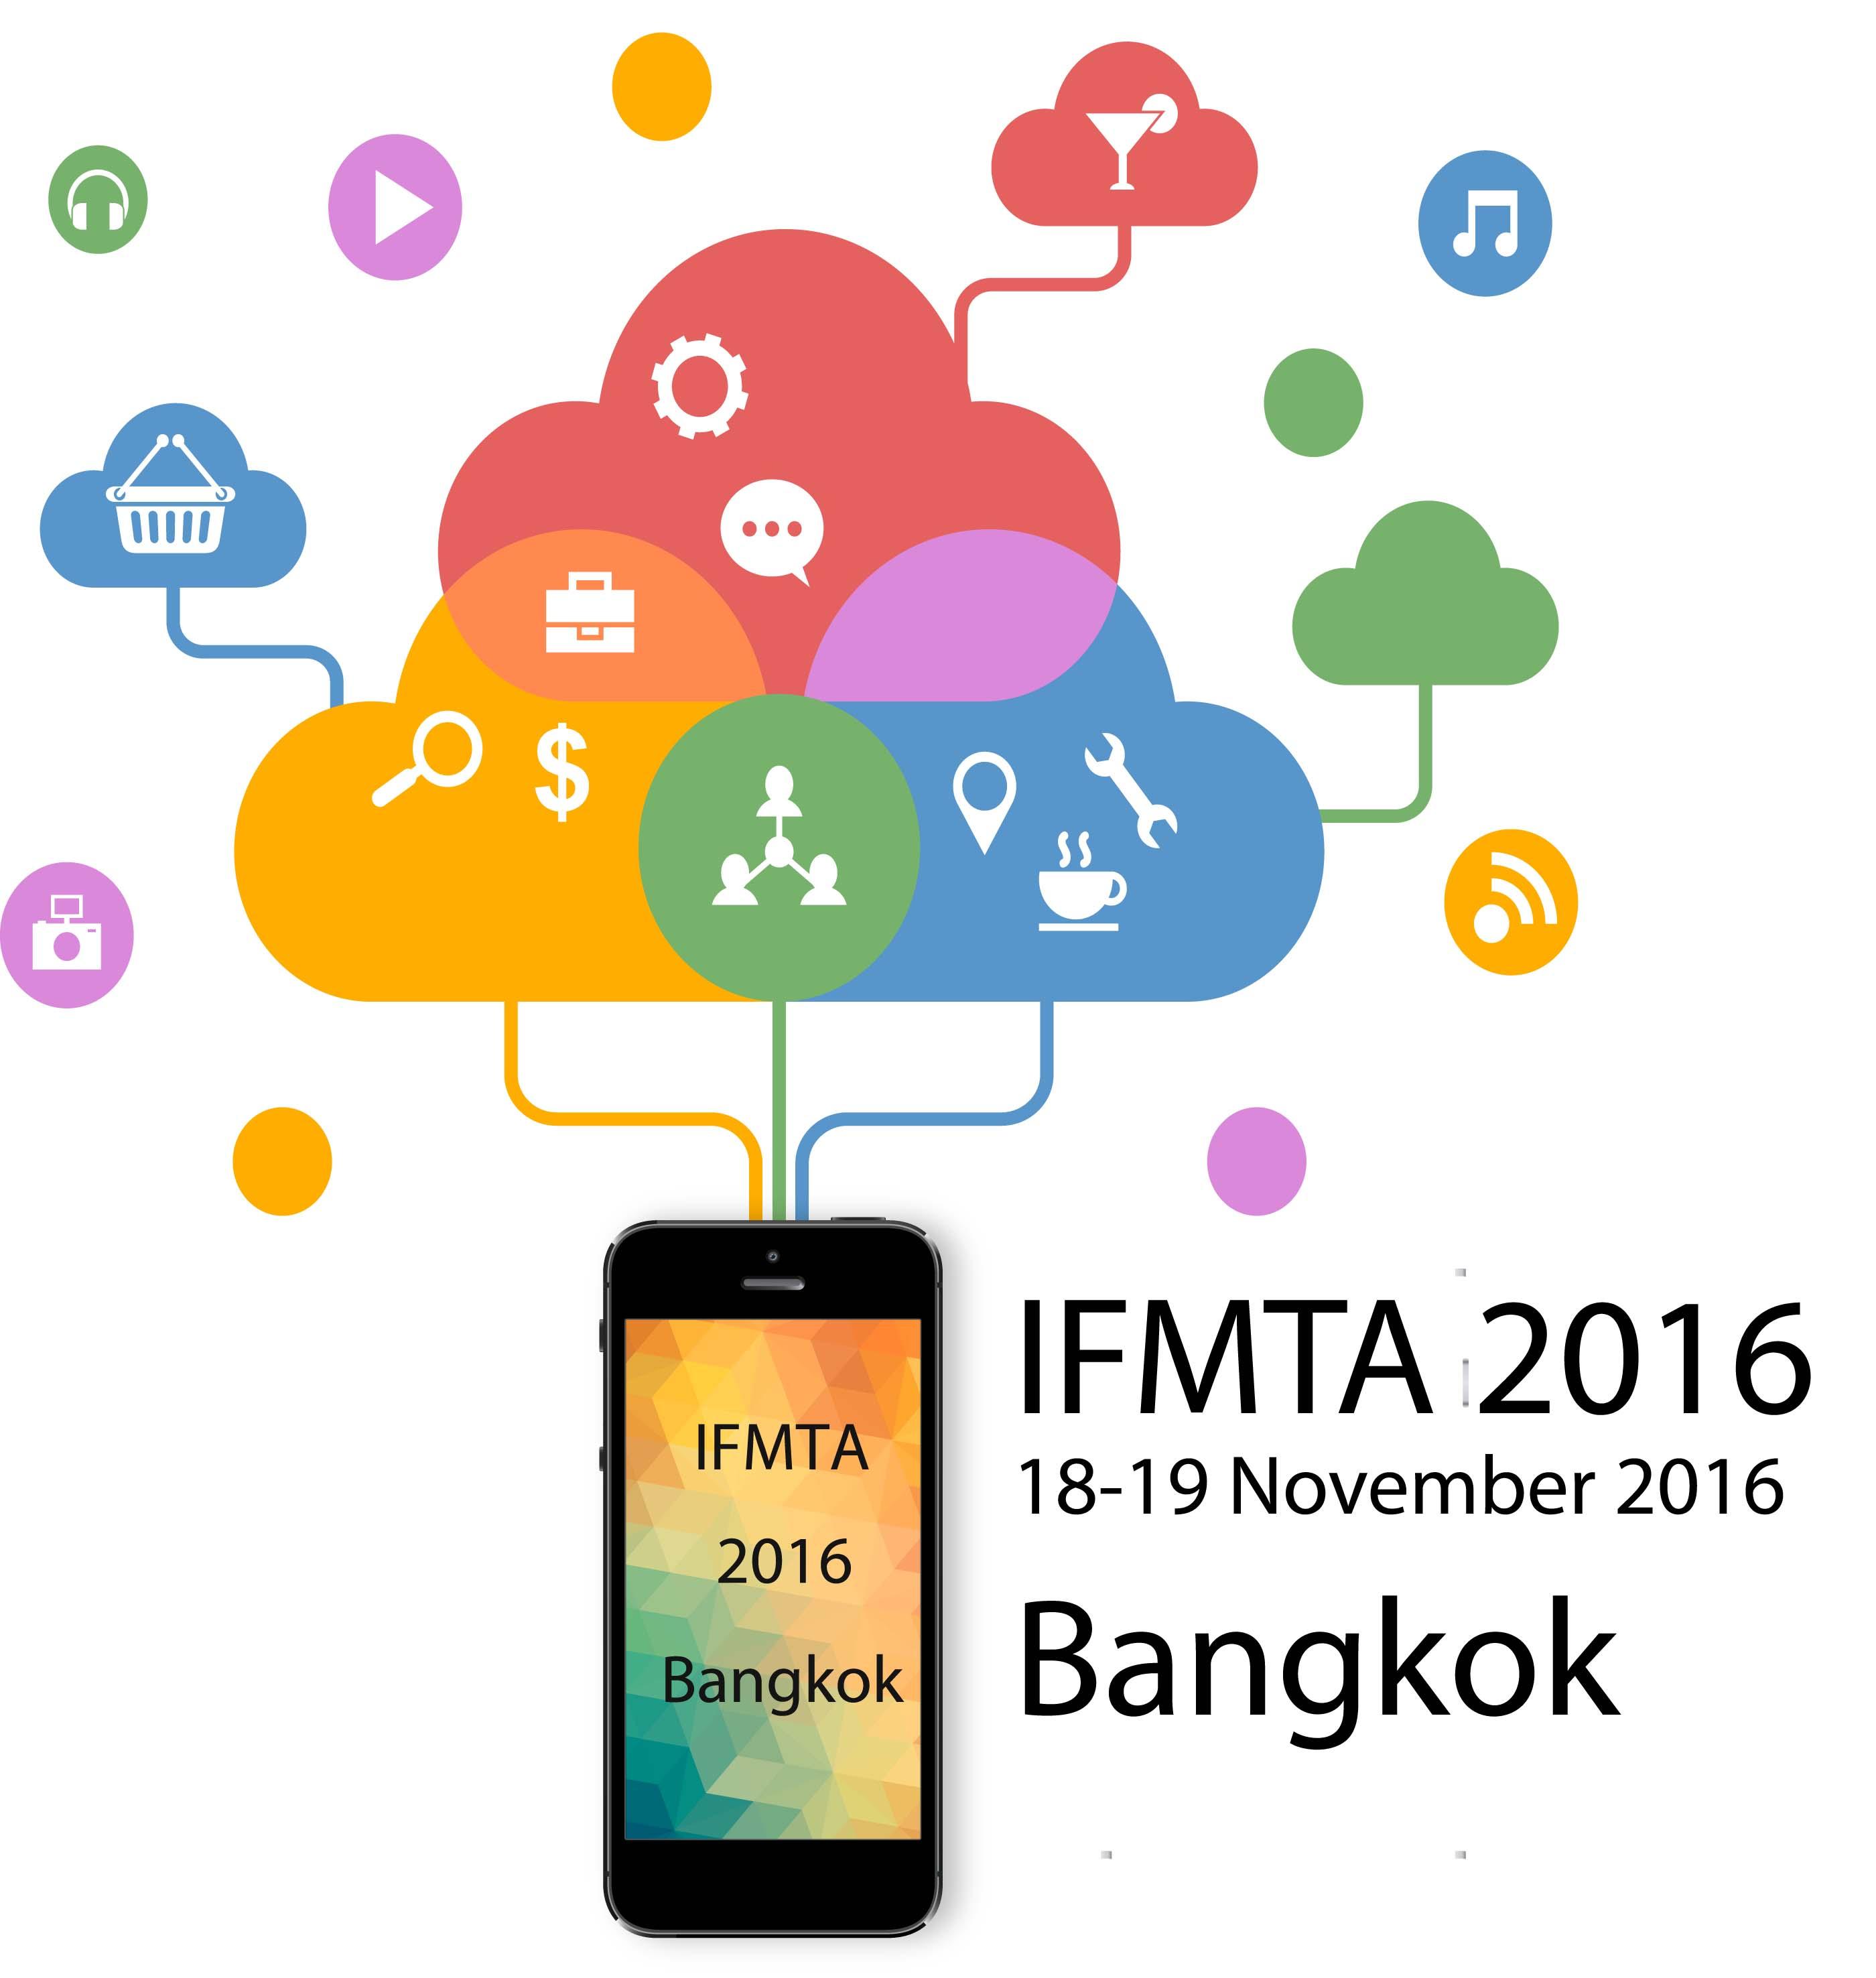 IFMTA 2016 Bangkok